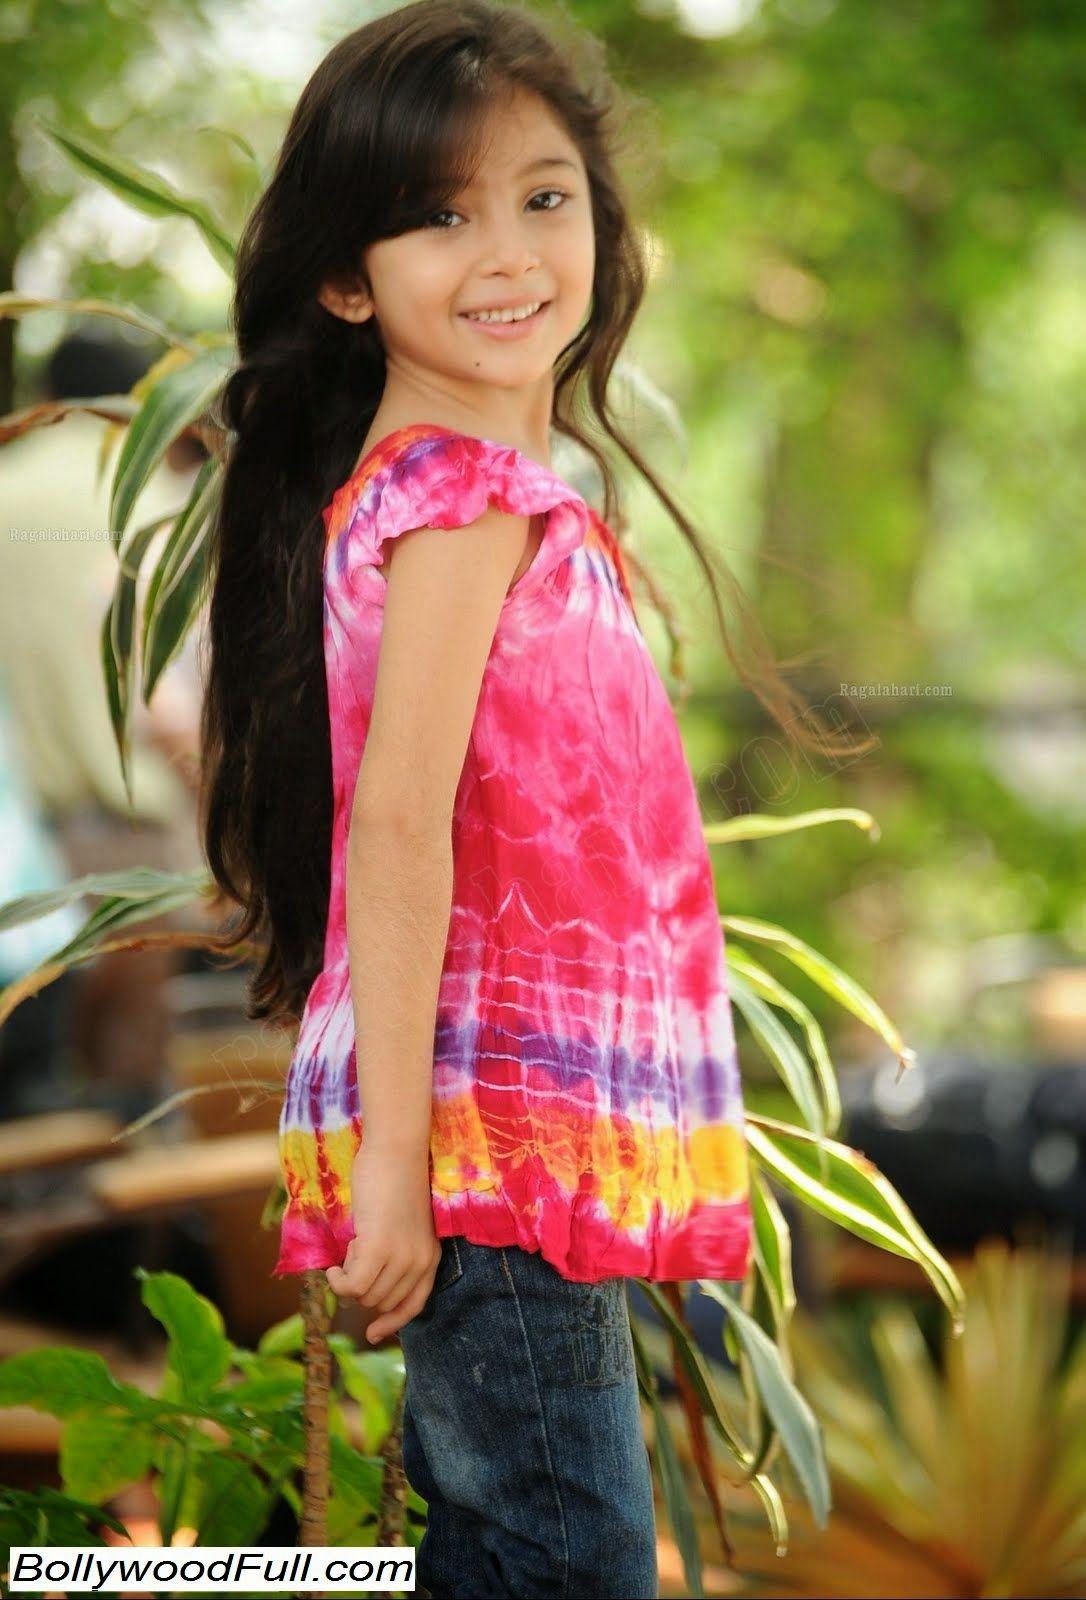 Wallpaper Of Little Girl In Bajrangi Bhaijaan 17 Most Beautiful Sara Arjun Pictures Very Cute Indian